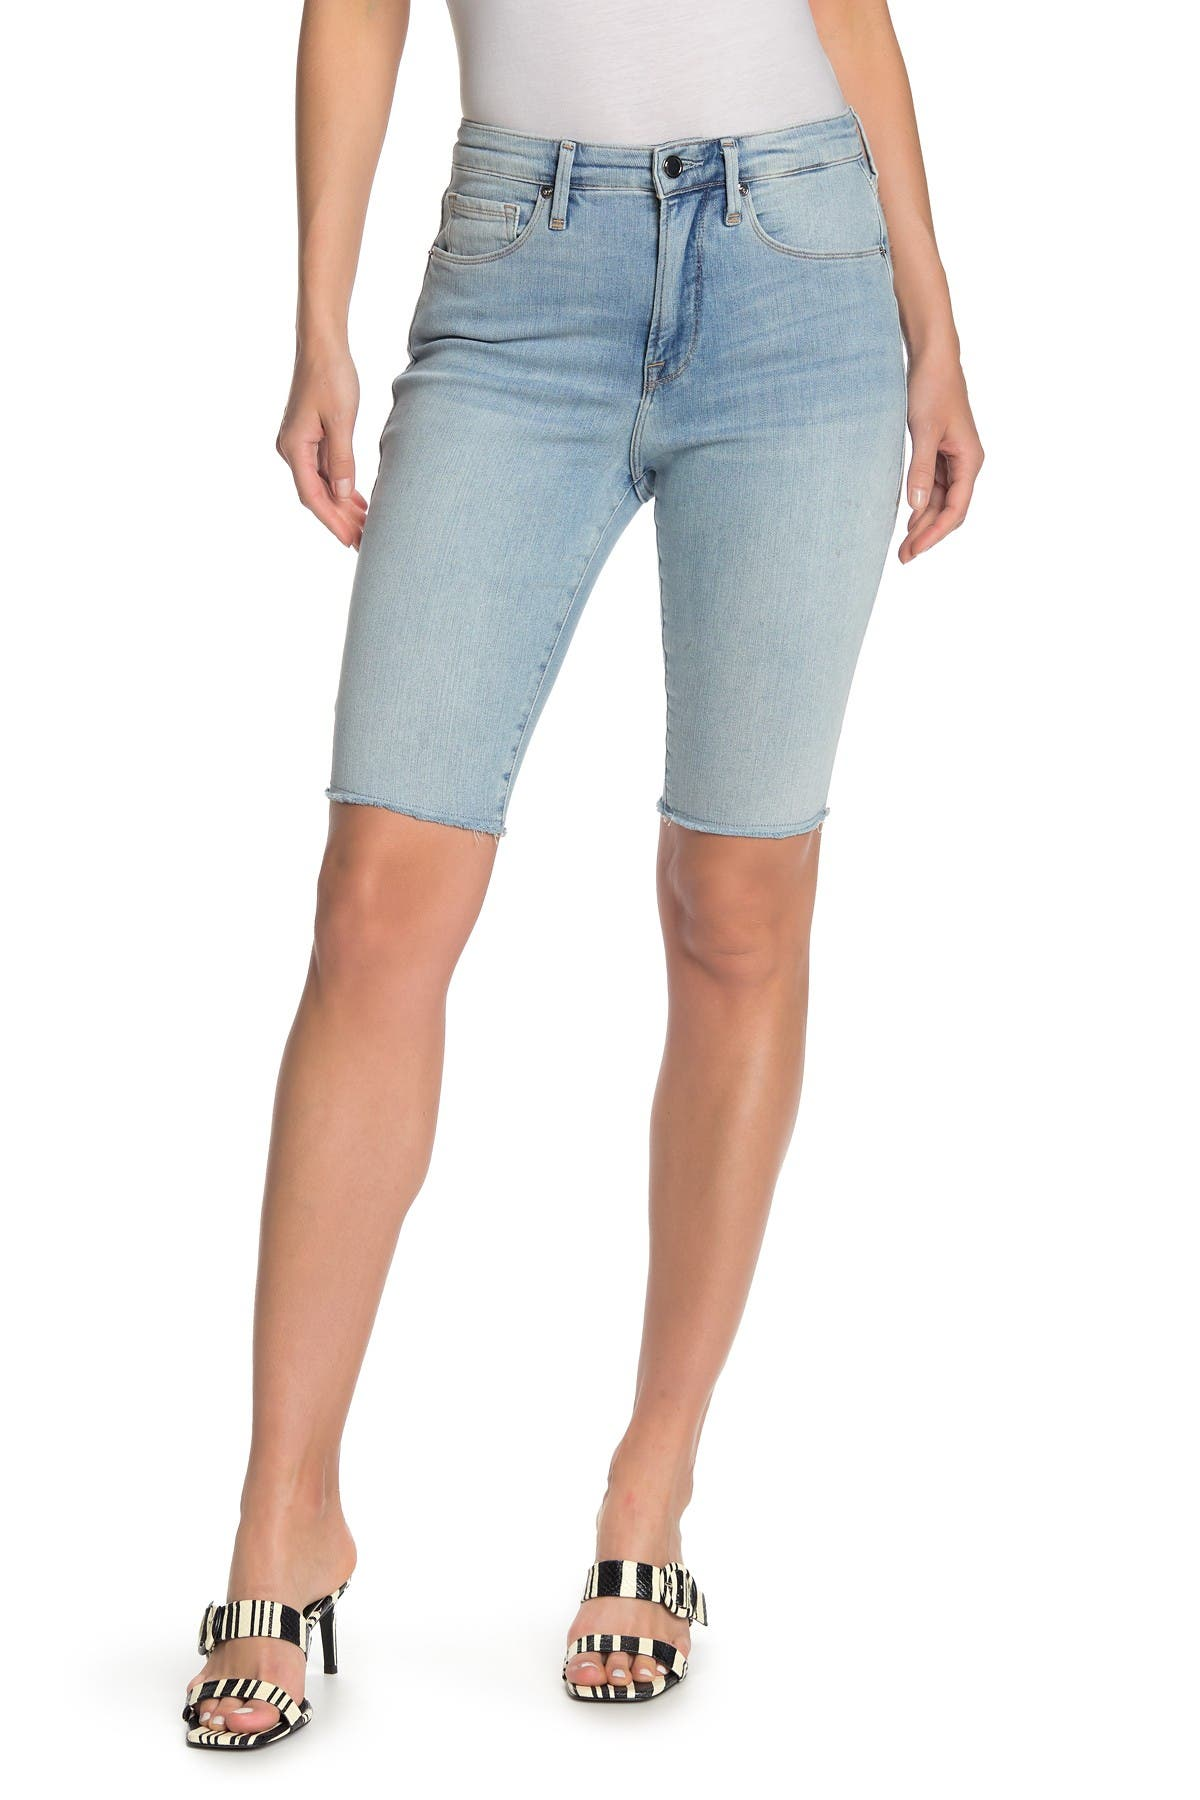 Image of Good American High Waist Bermuda Shorts